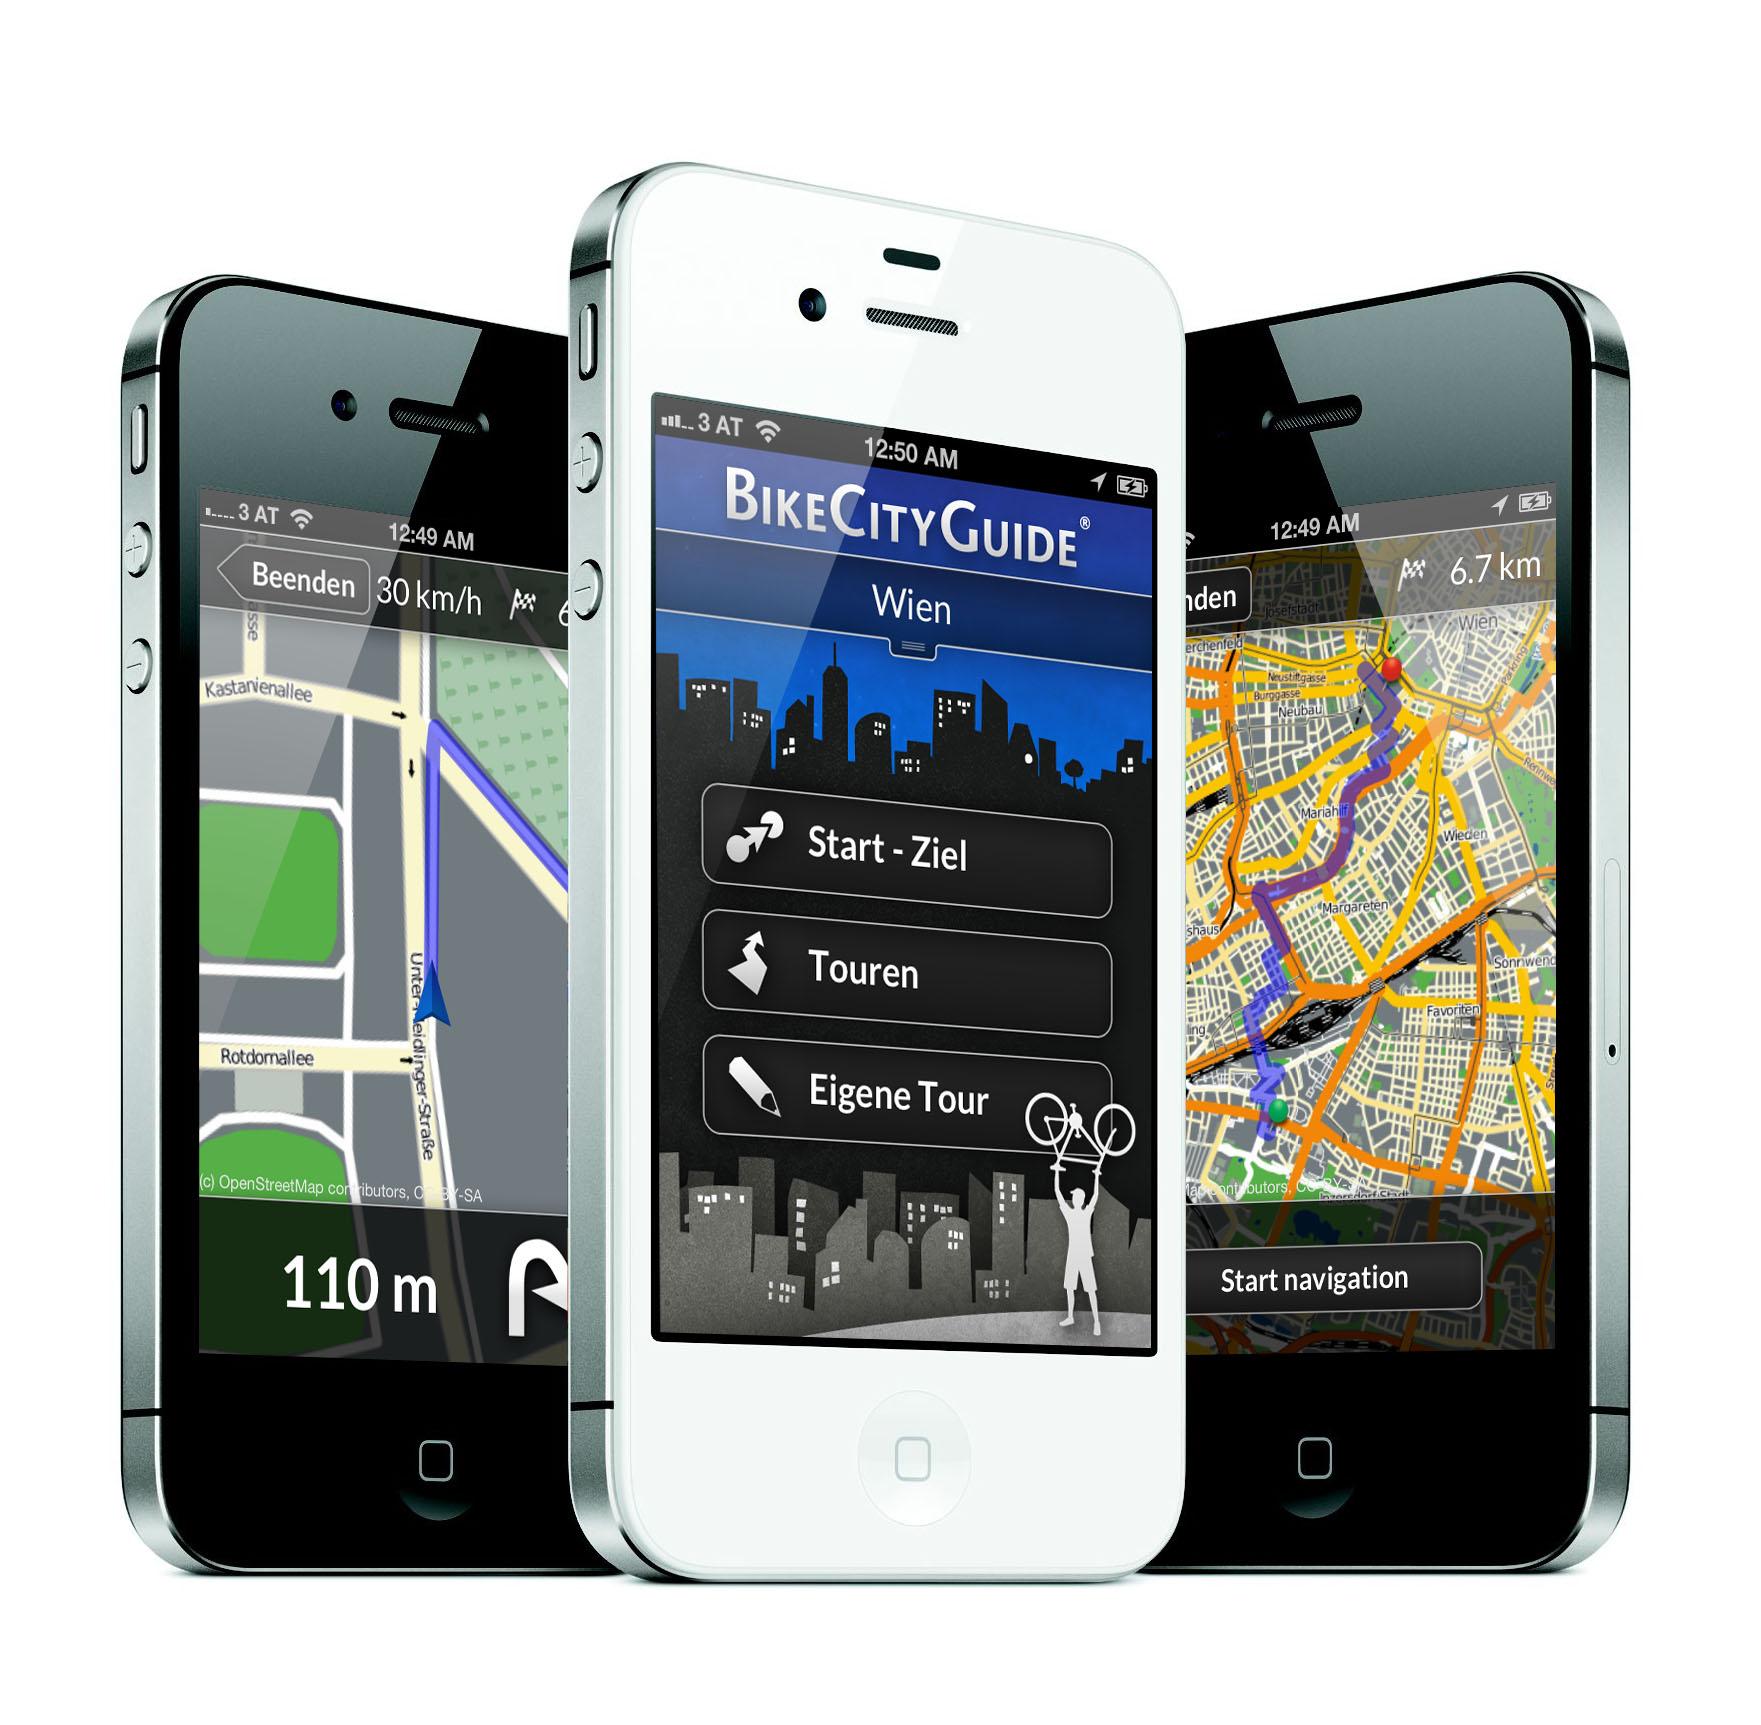 bikecityguide rad navigation mit insider touren itopnews. Black Bedroom Furniture Sets. Home Design Ideas